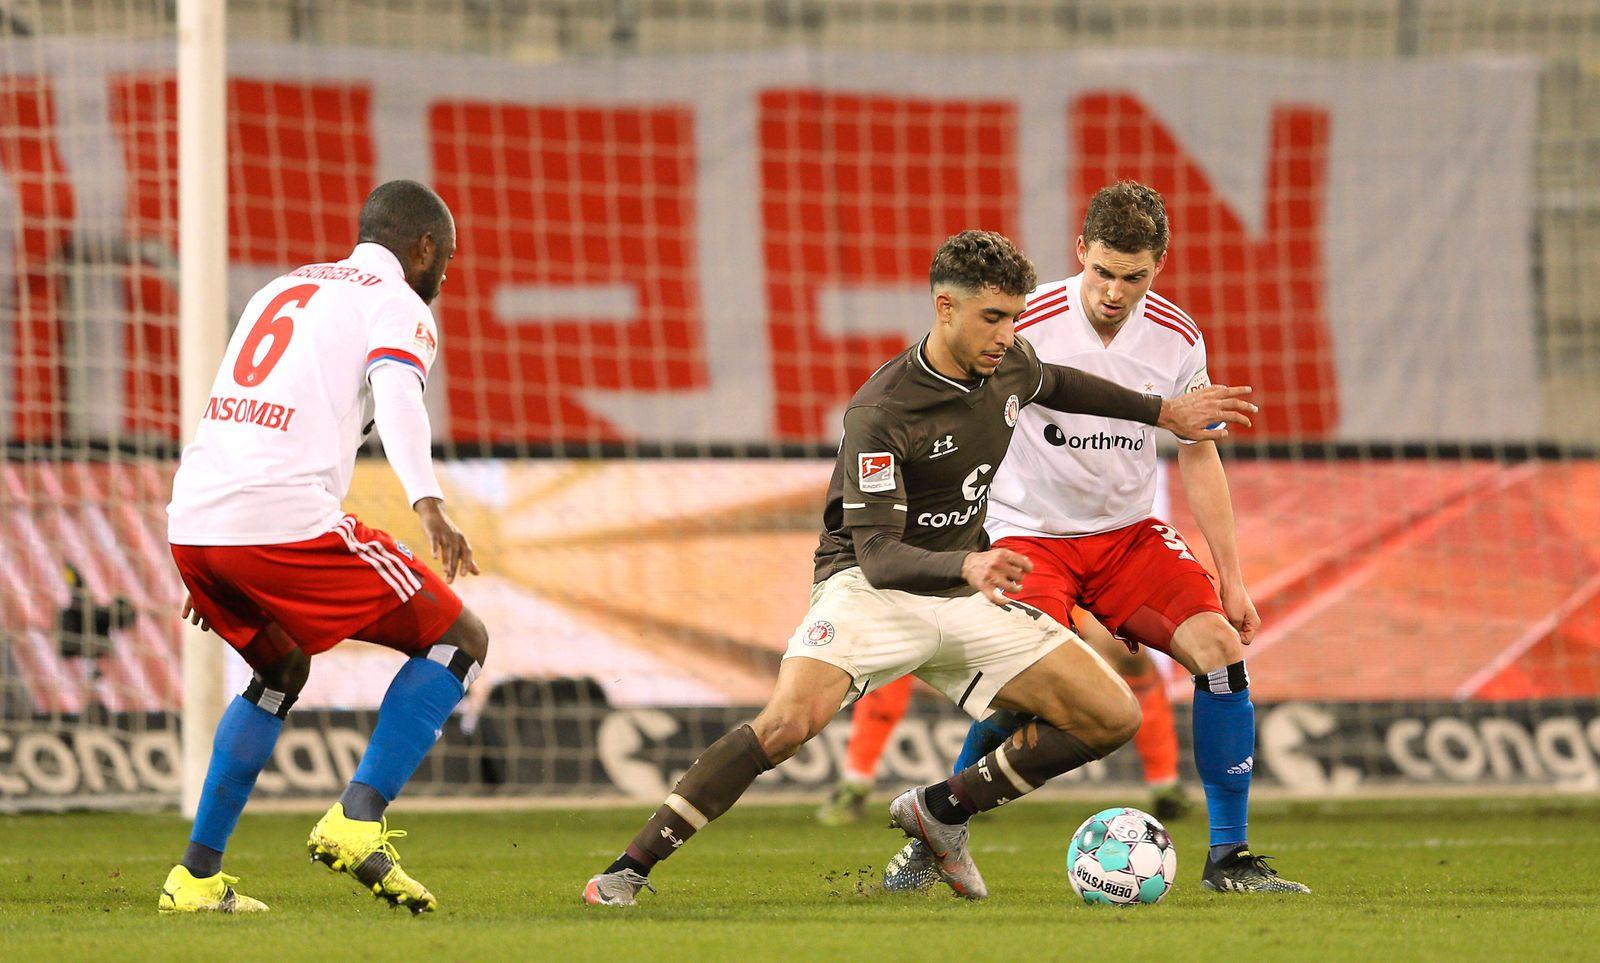 Foto : Omar Marmoush ( St. Pauli ) gegen Moritz Heyer und links David Kinsombi Fussball 2. Bundesliga am Mo. 01.03.2021